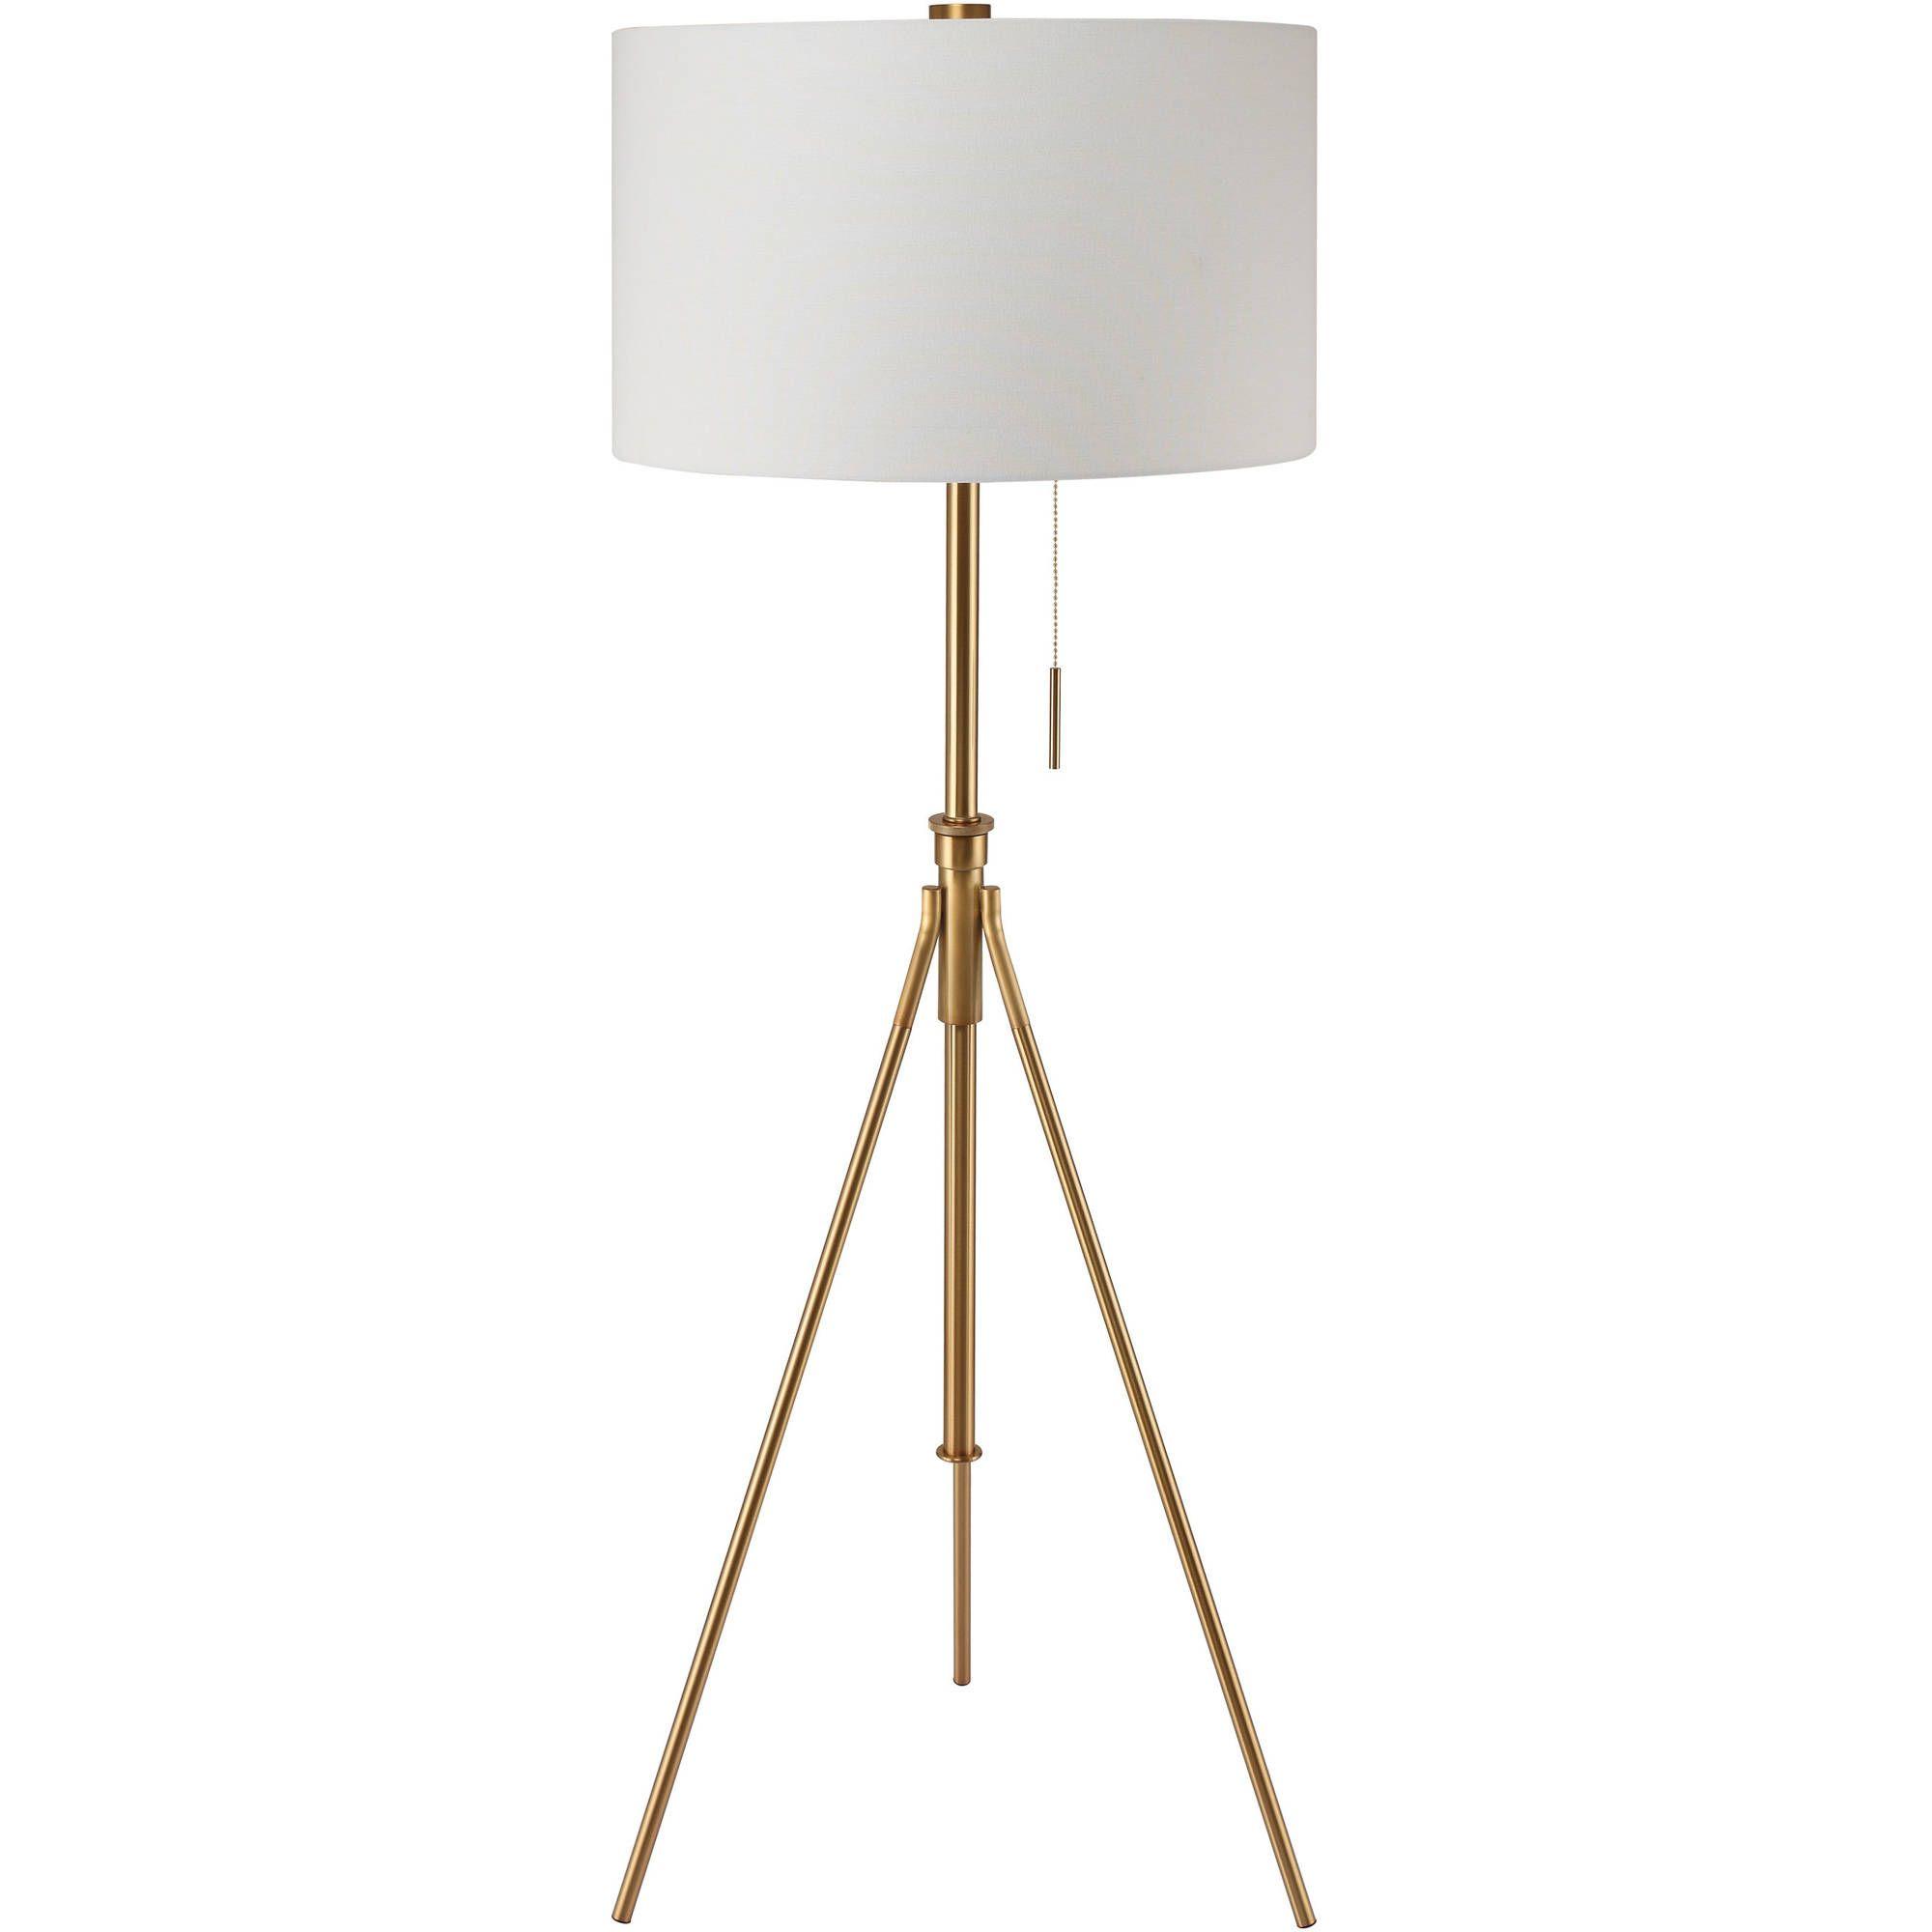 "58"" to 72""H MidCentury Adjustable Tripod Gold Floor Lamp"